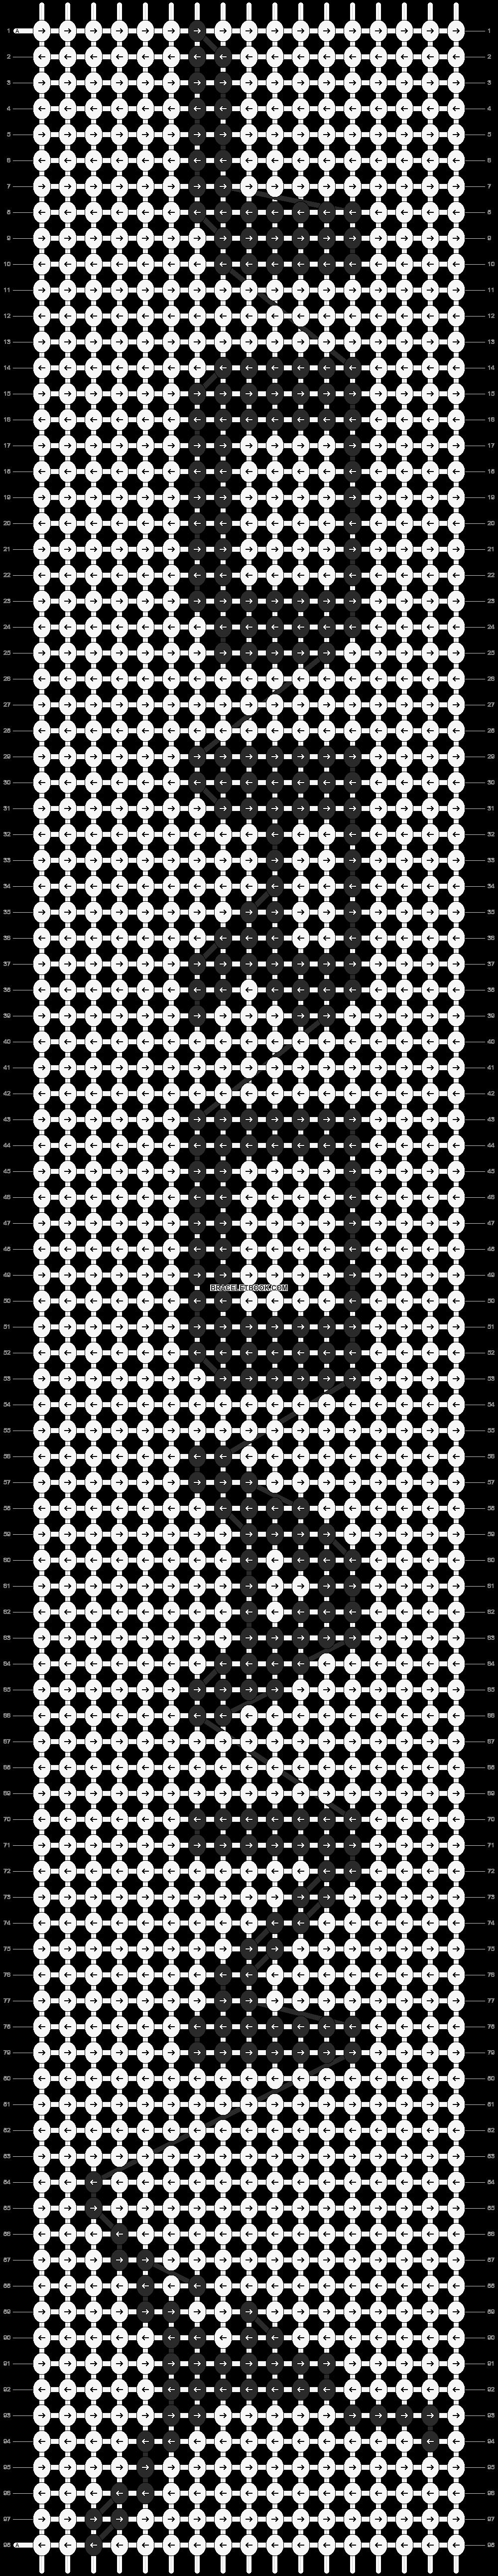 Alpha pattern #21009 pattern